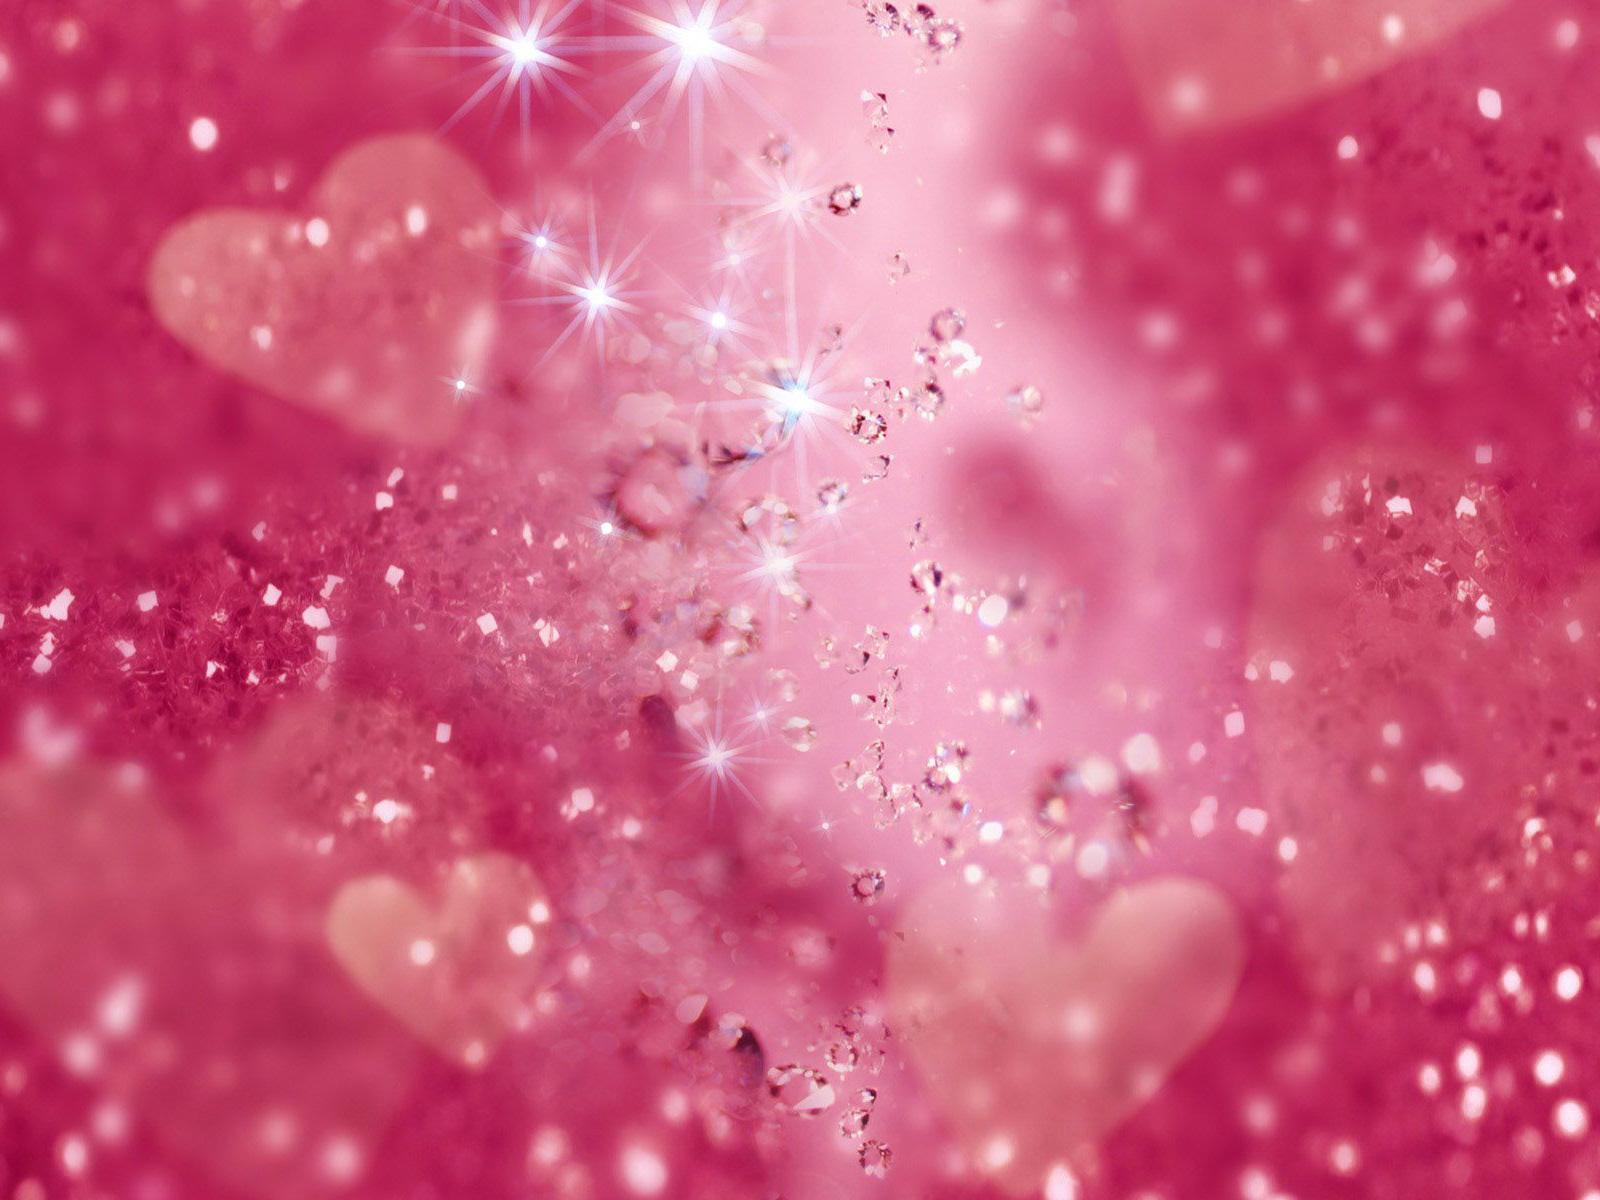 Pink wallpaper desktop Funny Amazing Images 1600x1200